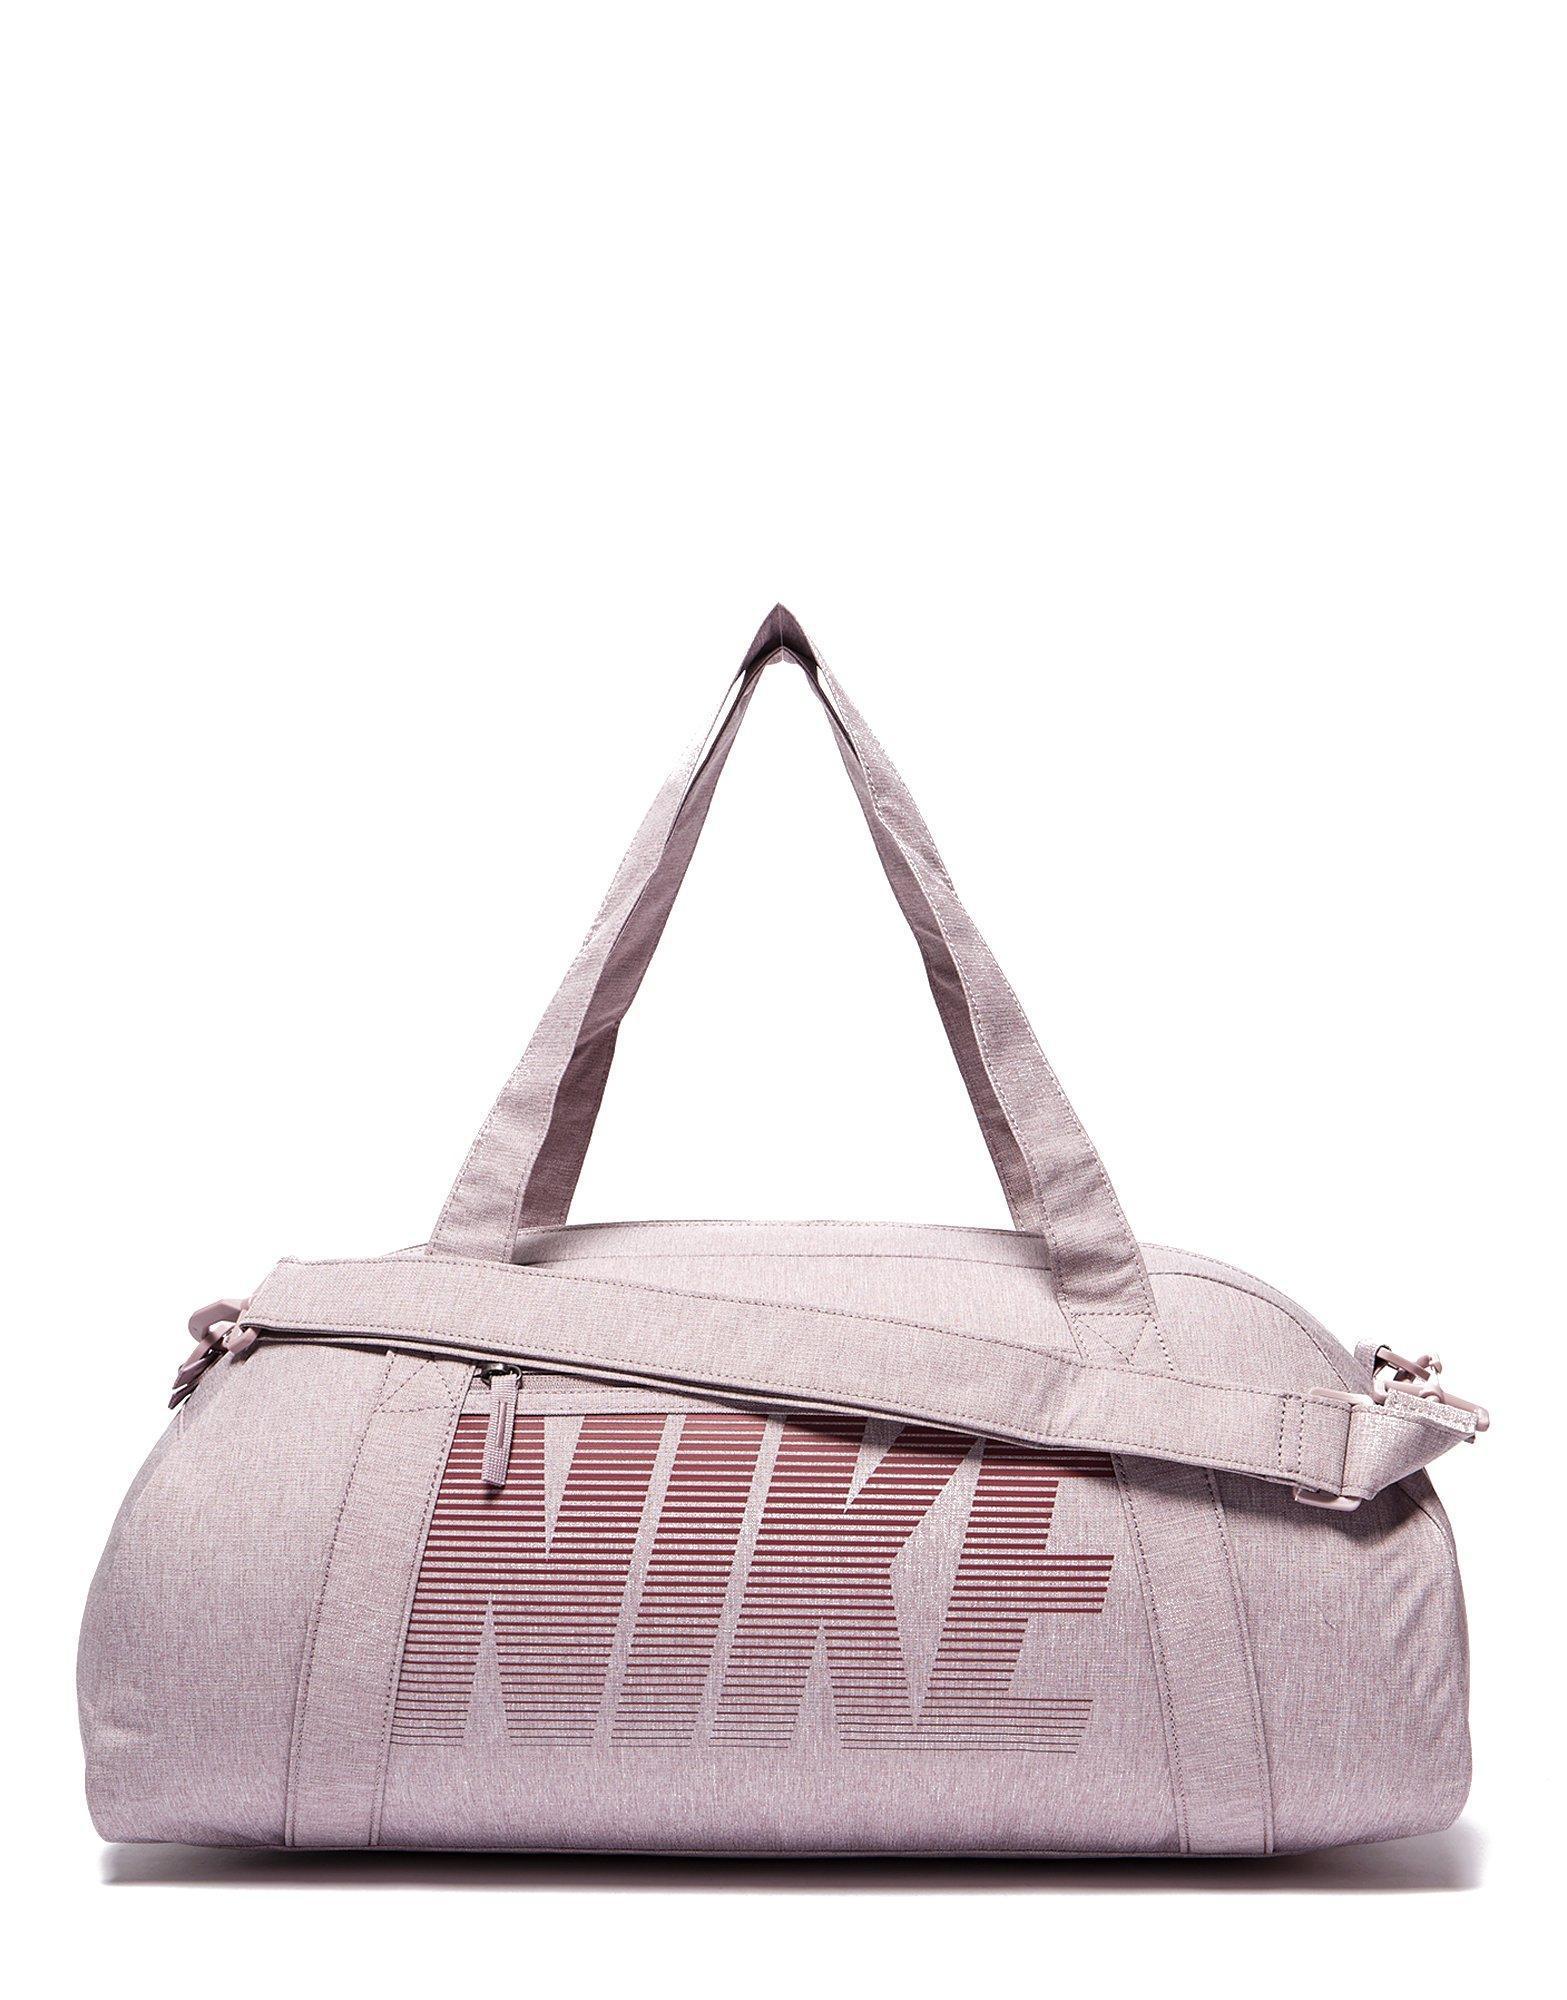 Lyst - Nike Gym Club Training Duffle Bag in Pink for Men 72decae4a4c0